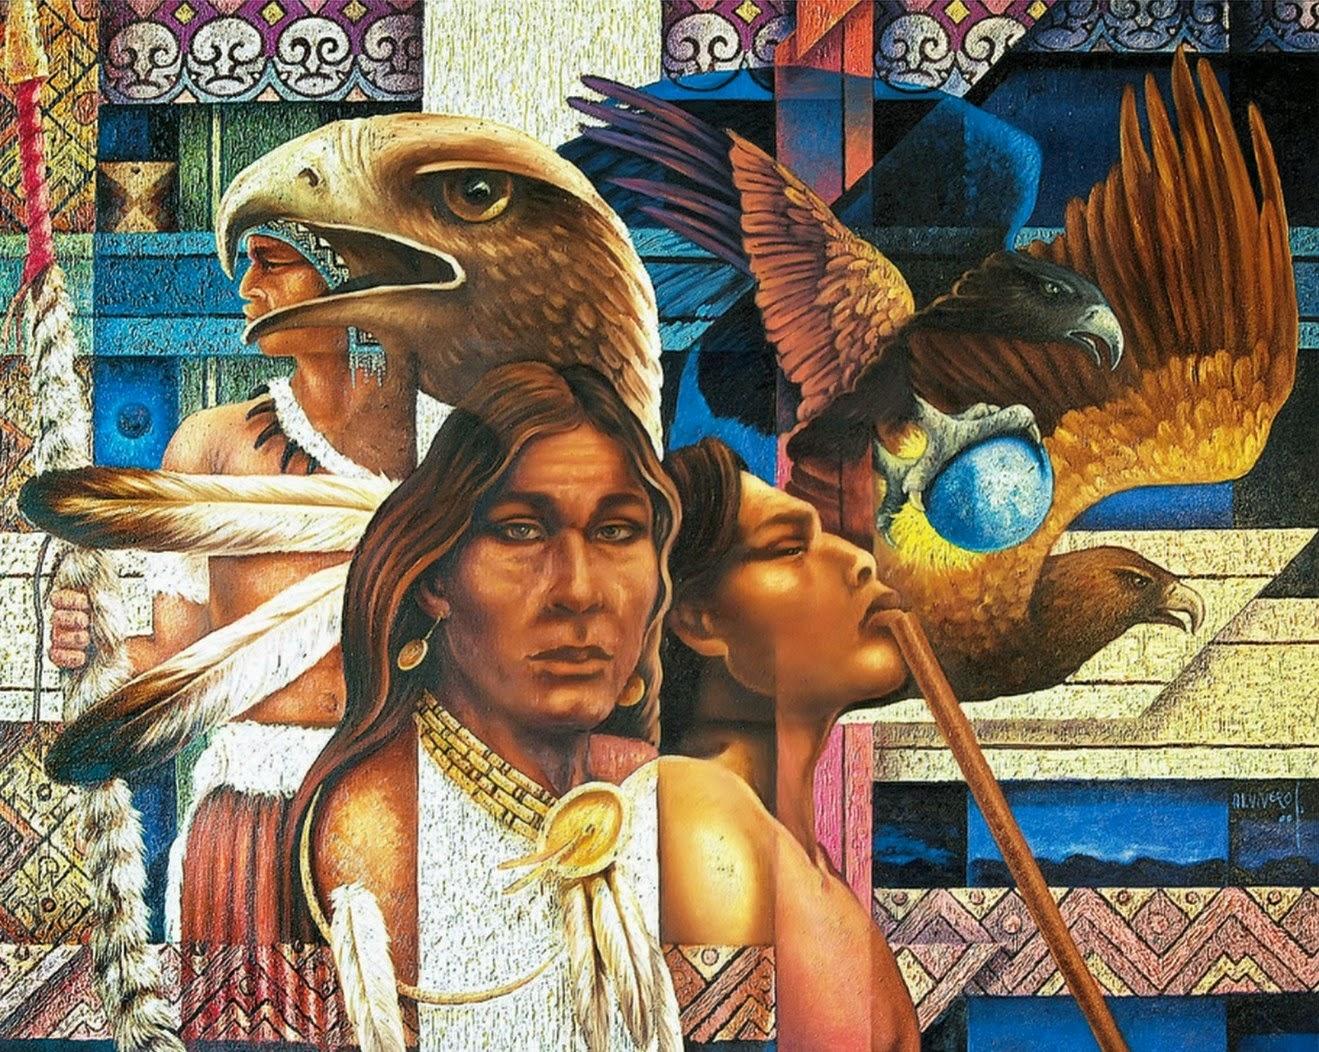 Polluelos indios americanos desnudos